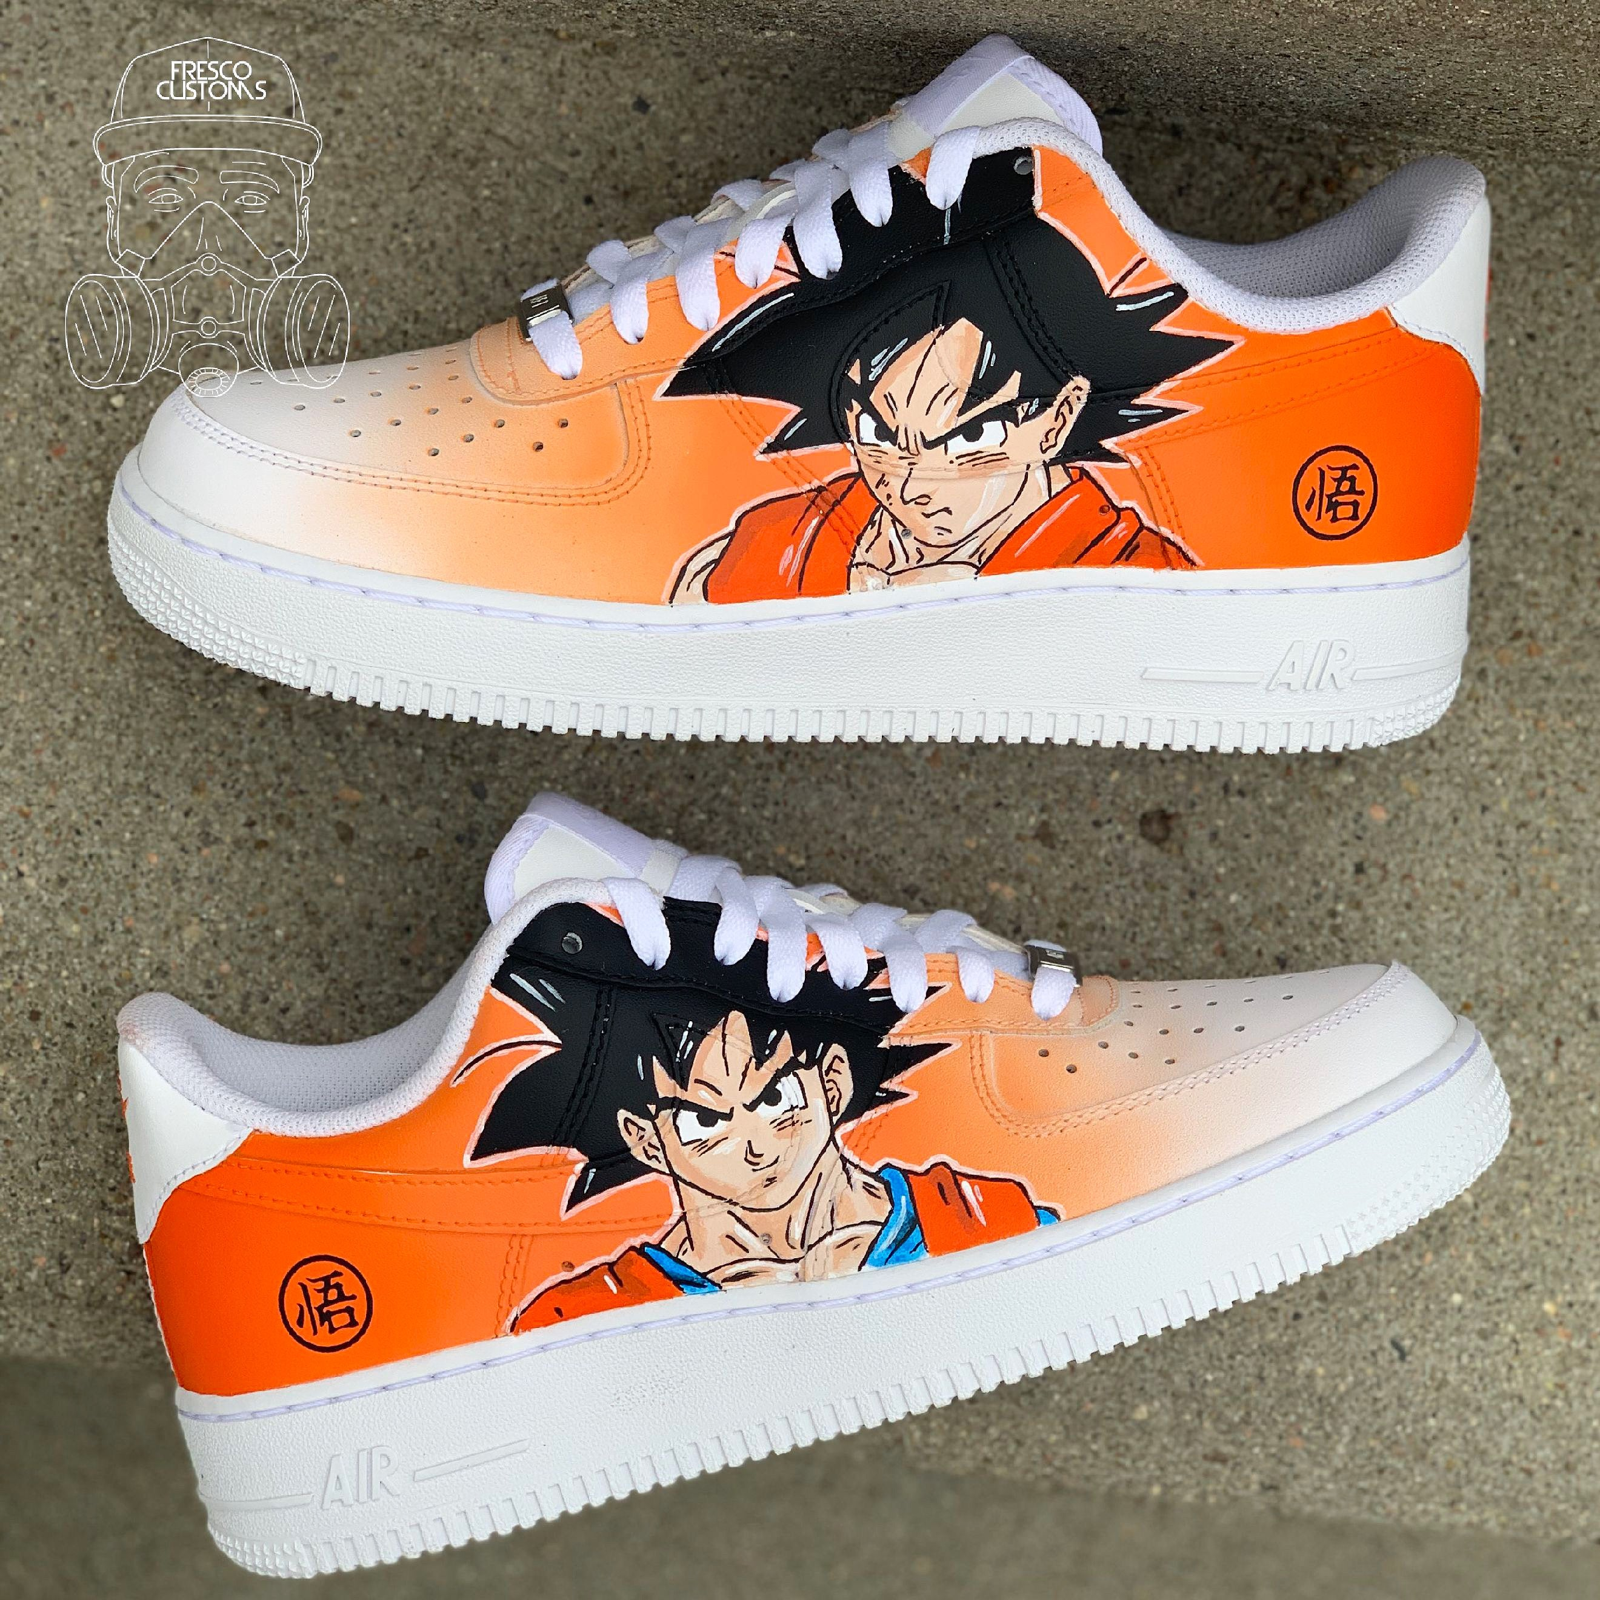 Goku Custom AF1s   Fresco Customs